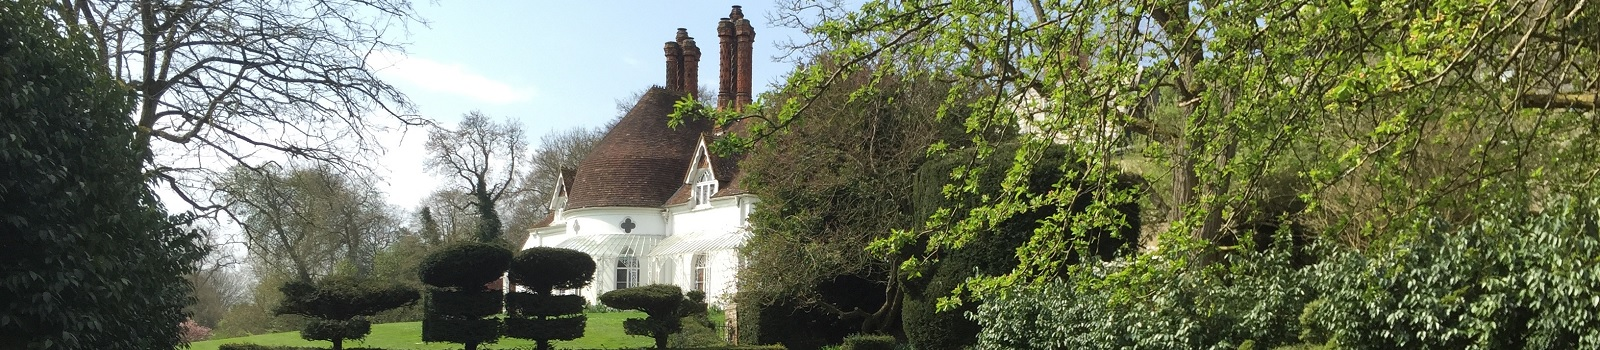 Houghton-Lodge-Gardens